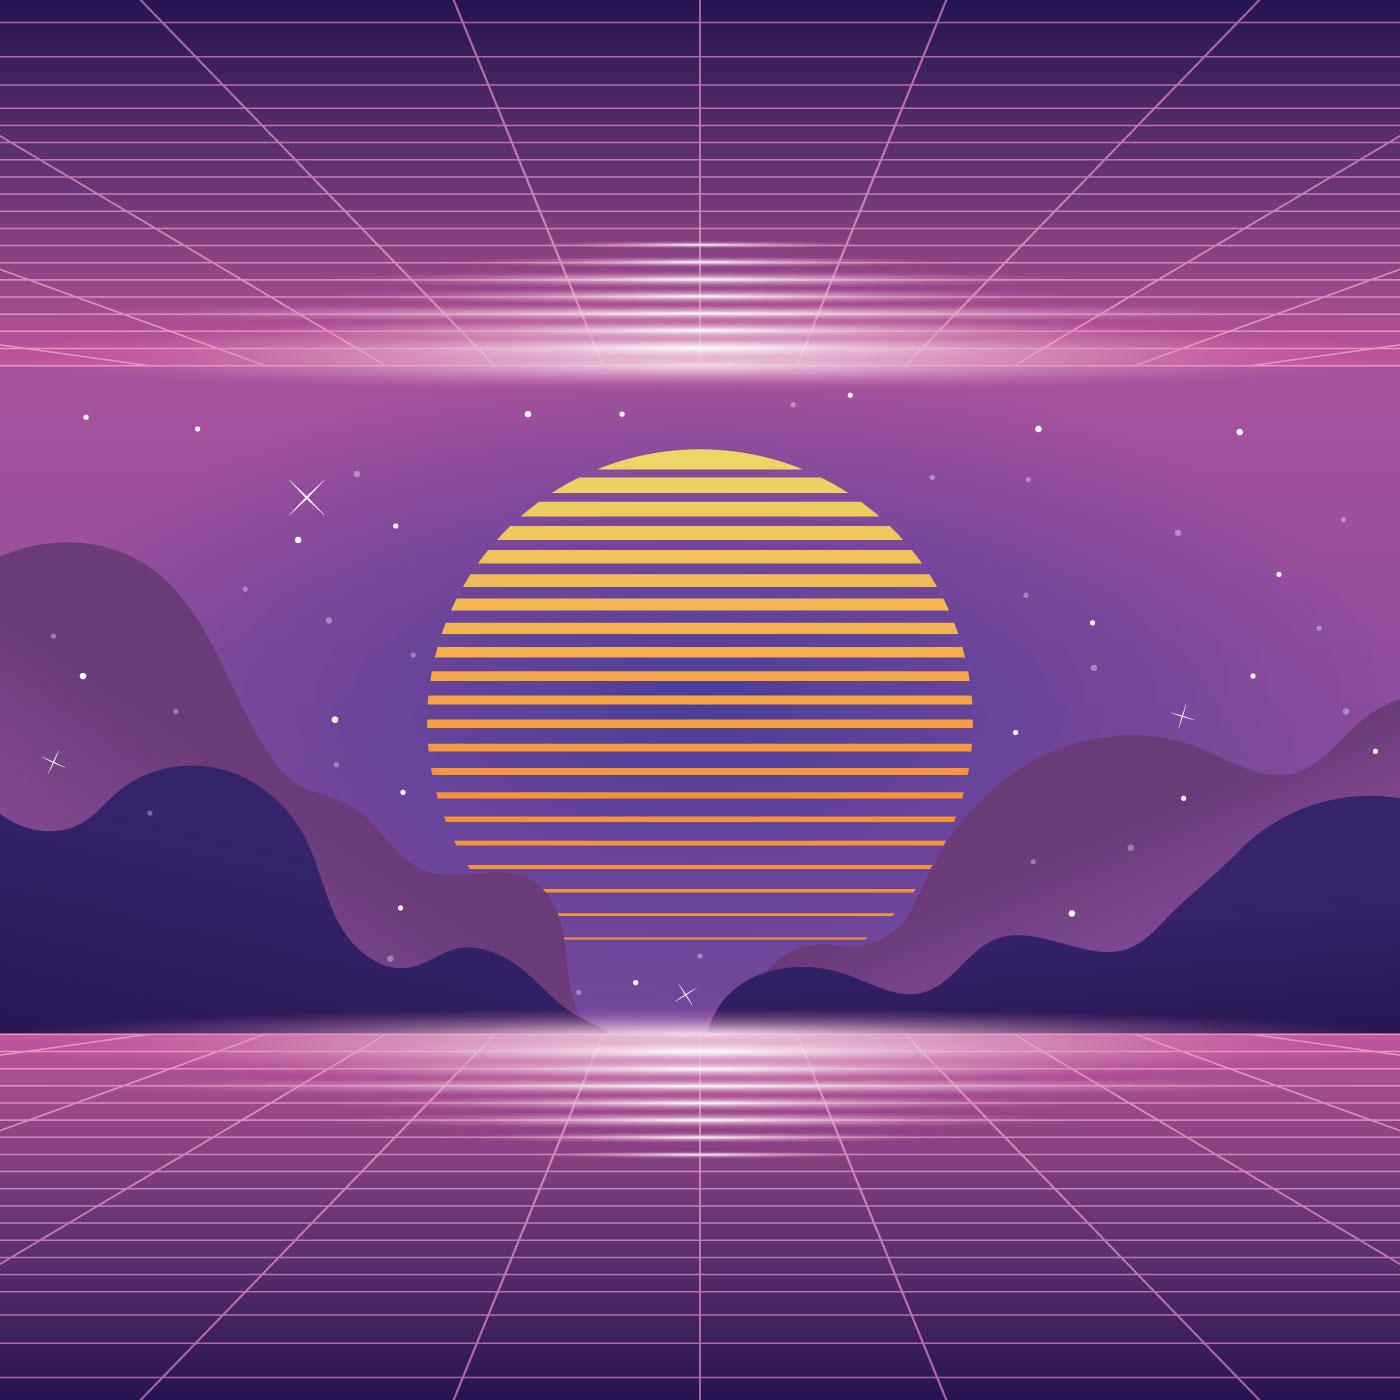 Vaporwave Background Free Vector Art 29 Free Downloads